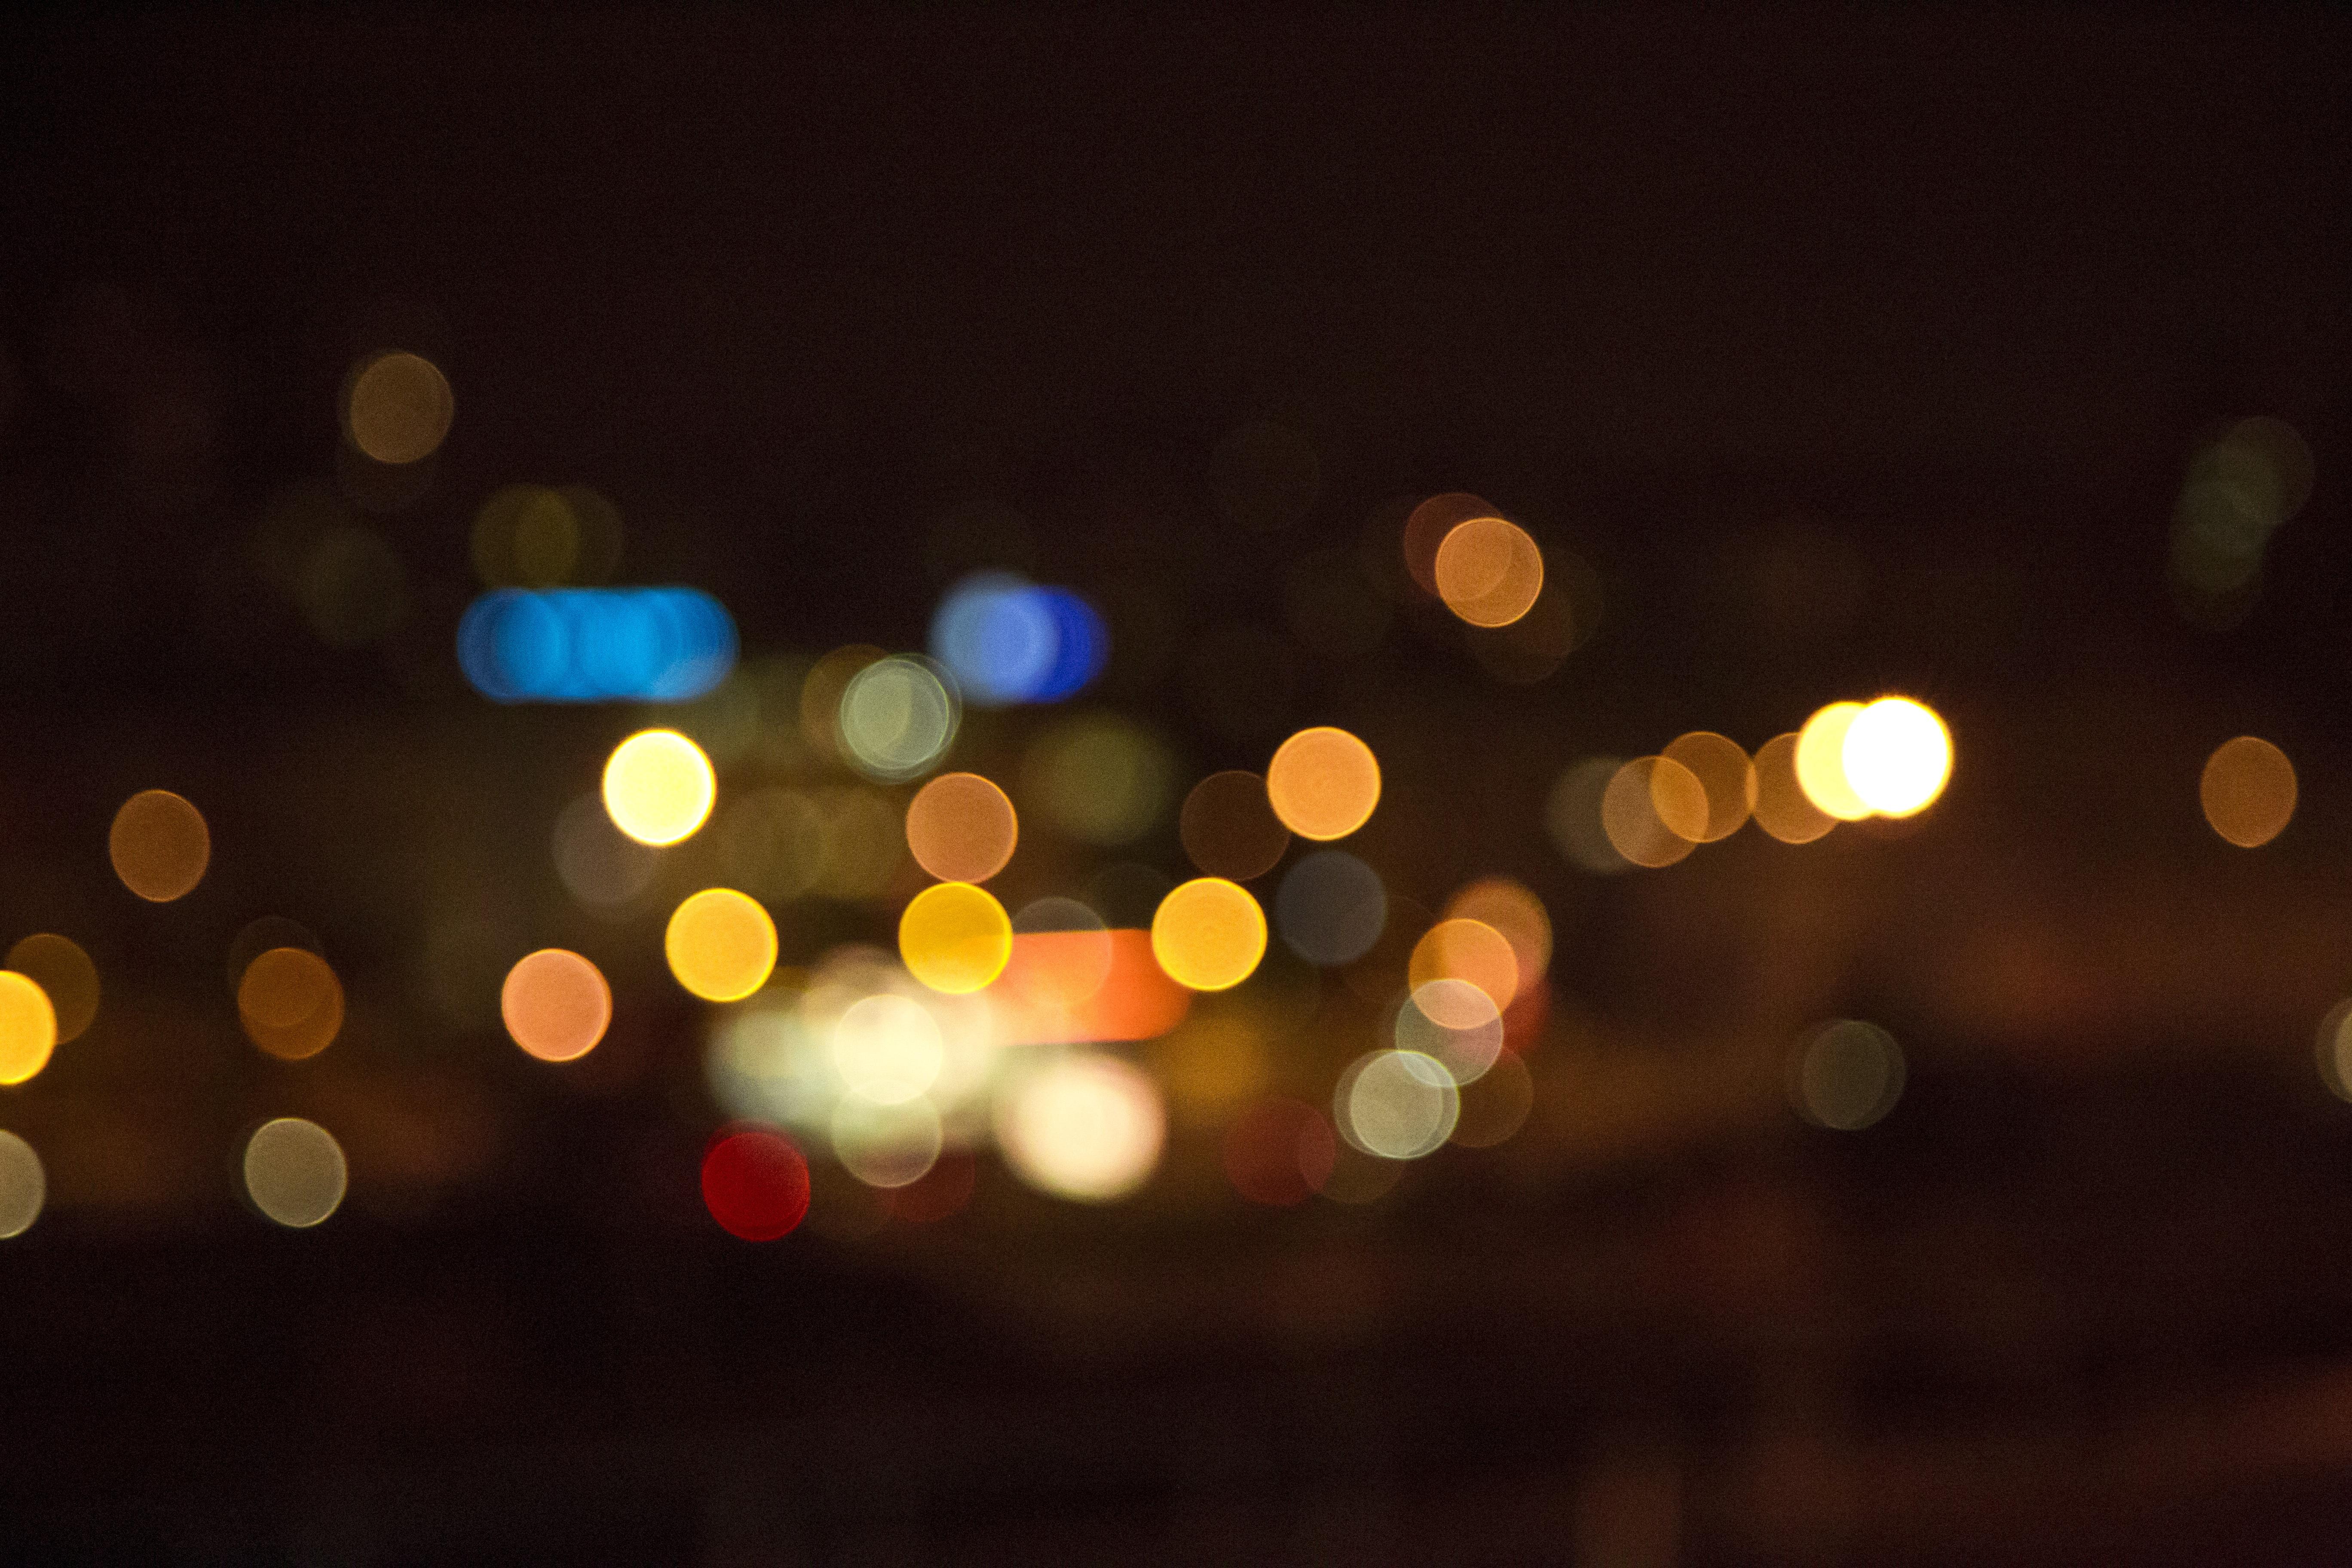 Blurred Lights Tumblr